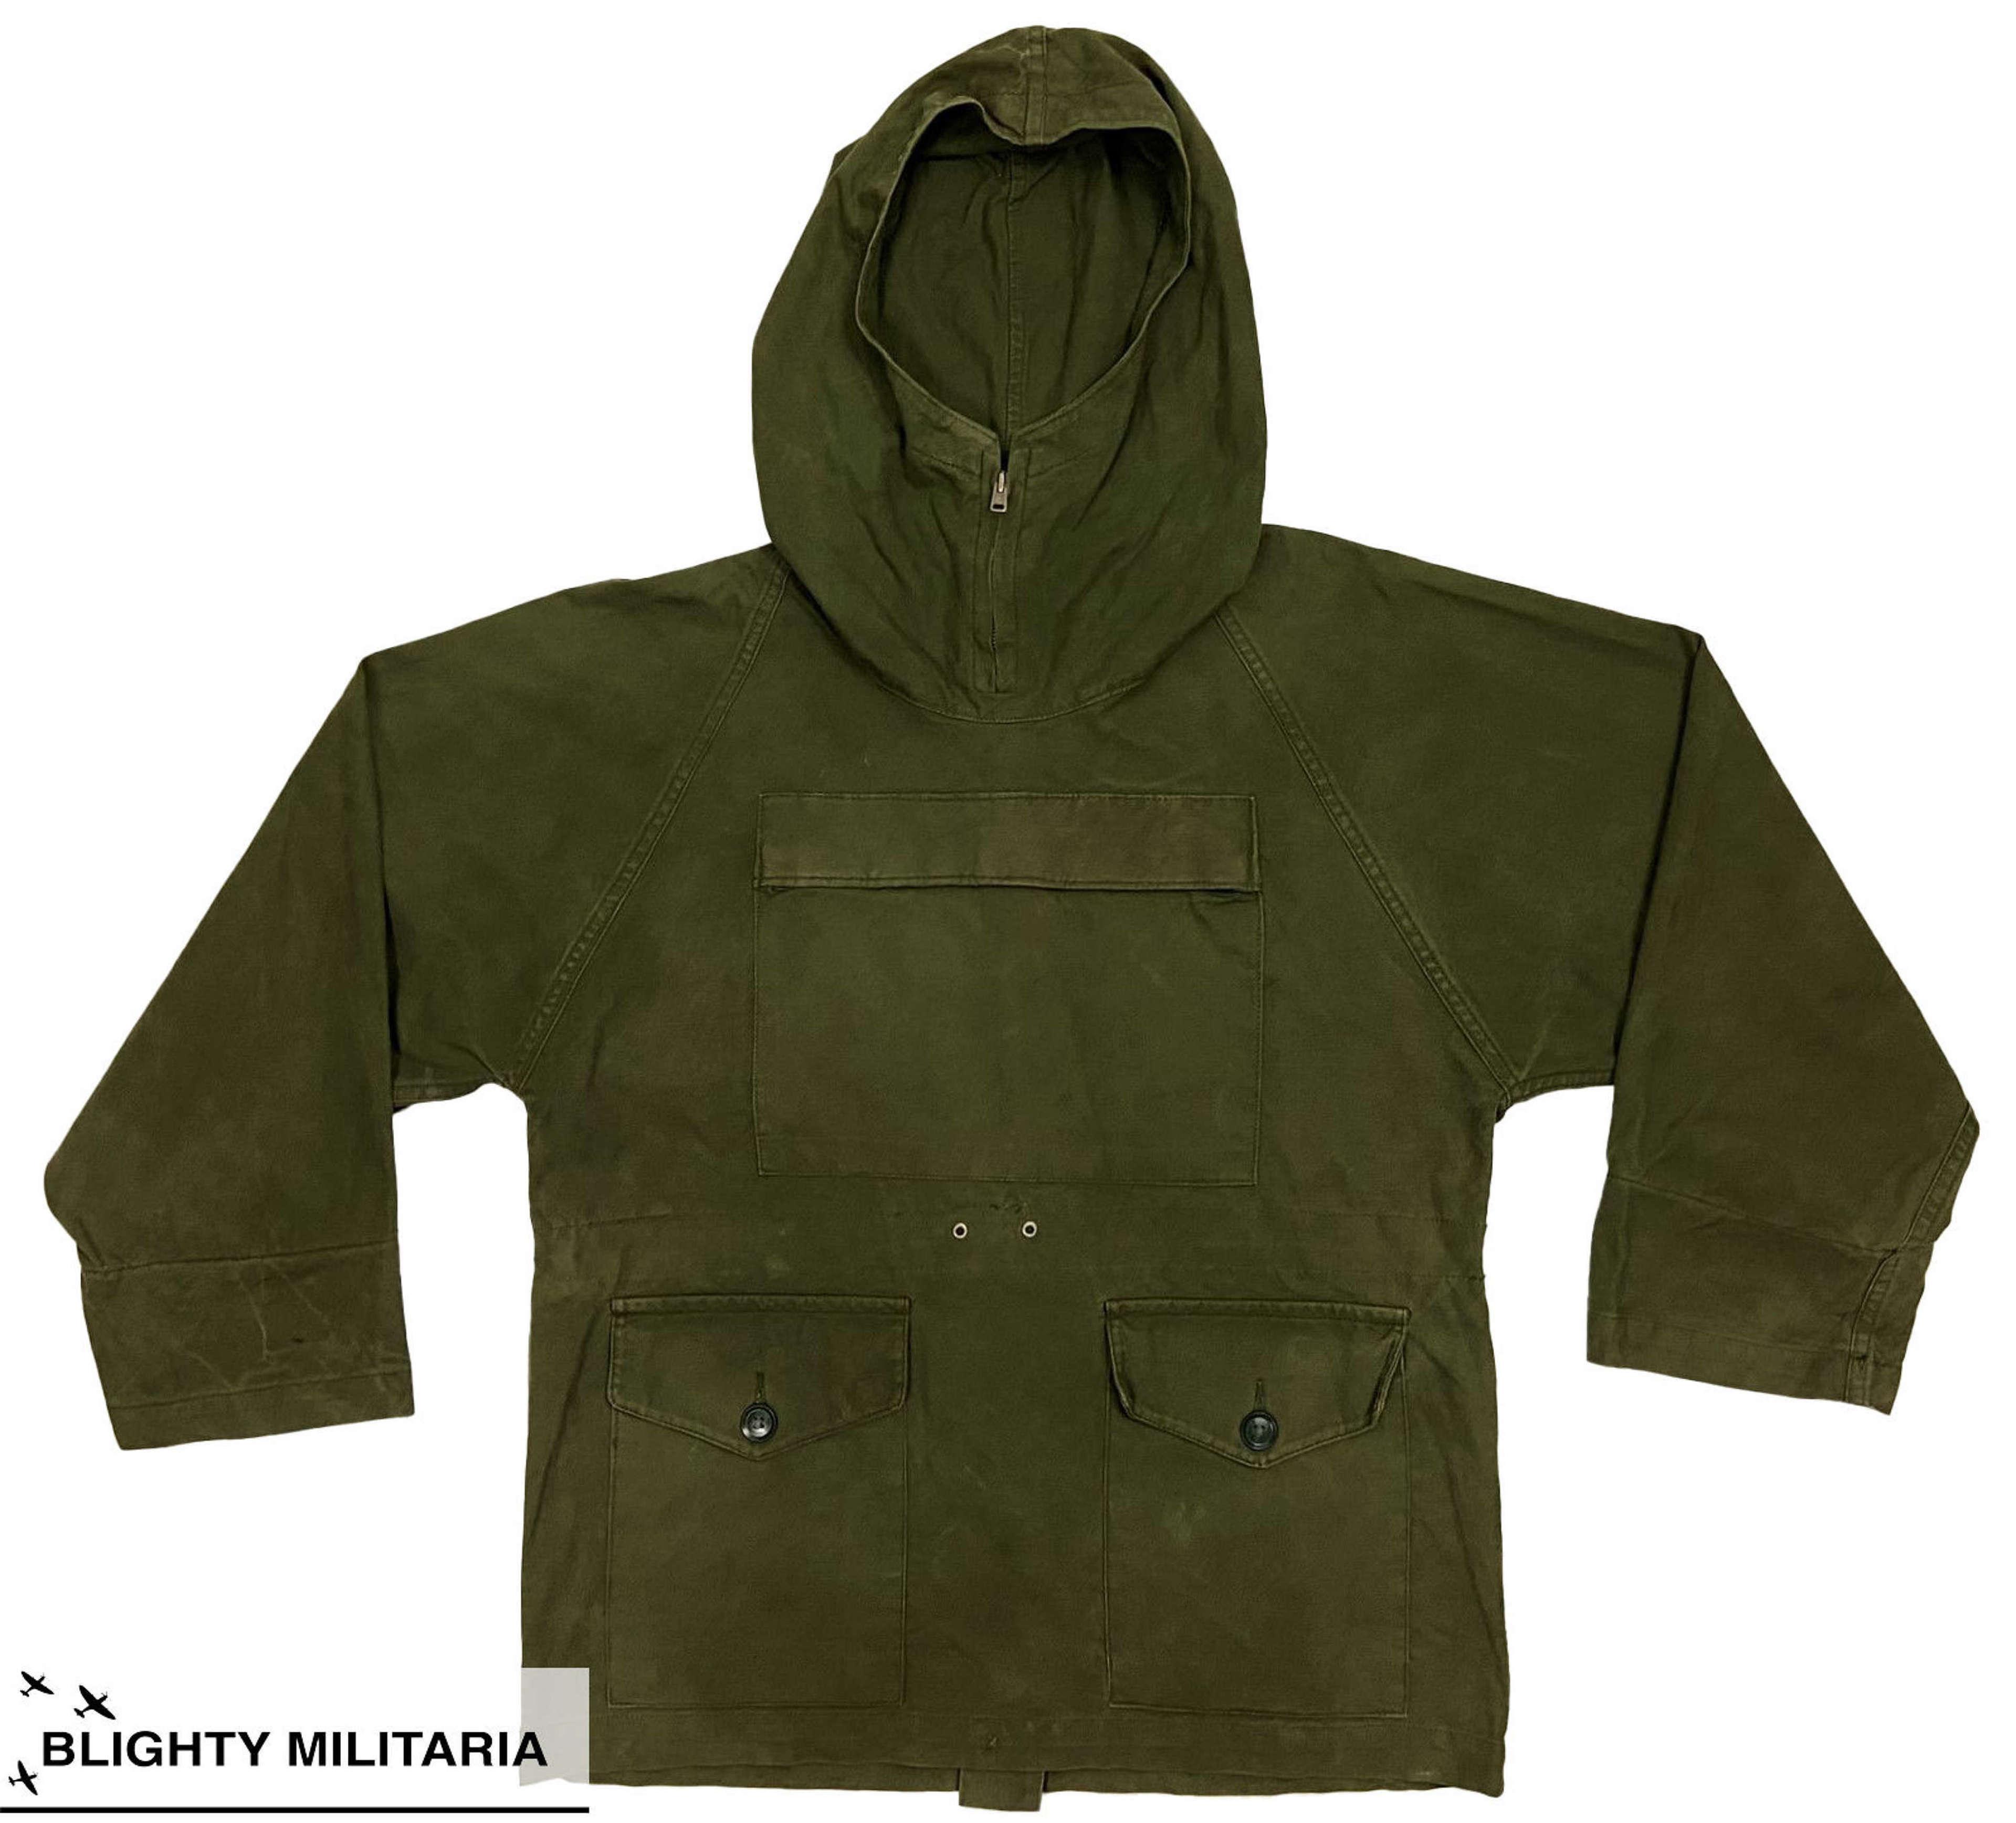 Original 1970s British Army Cadet Smock - Size 1